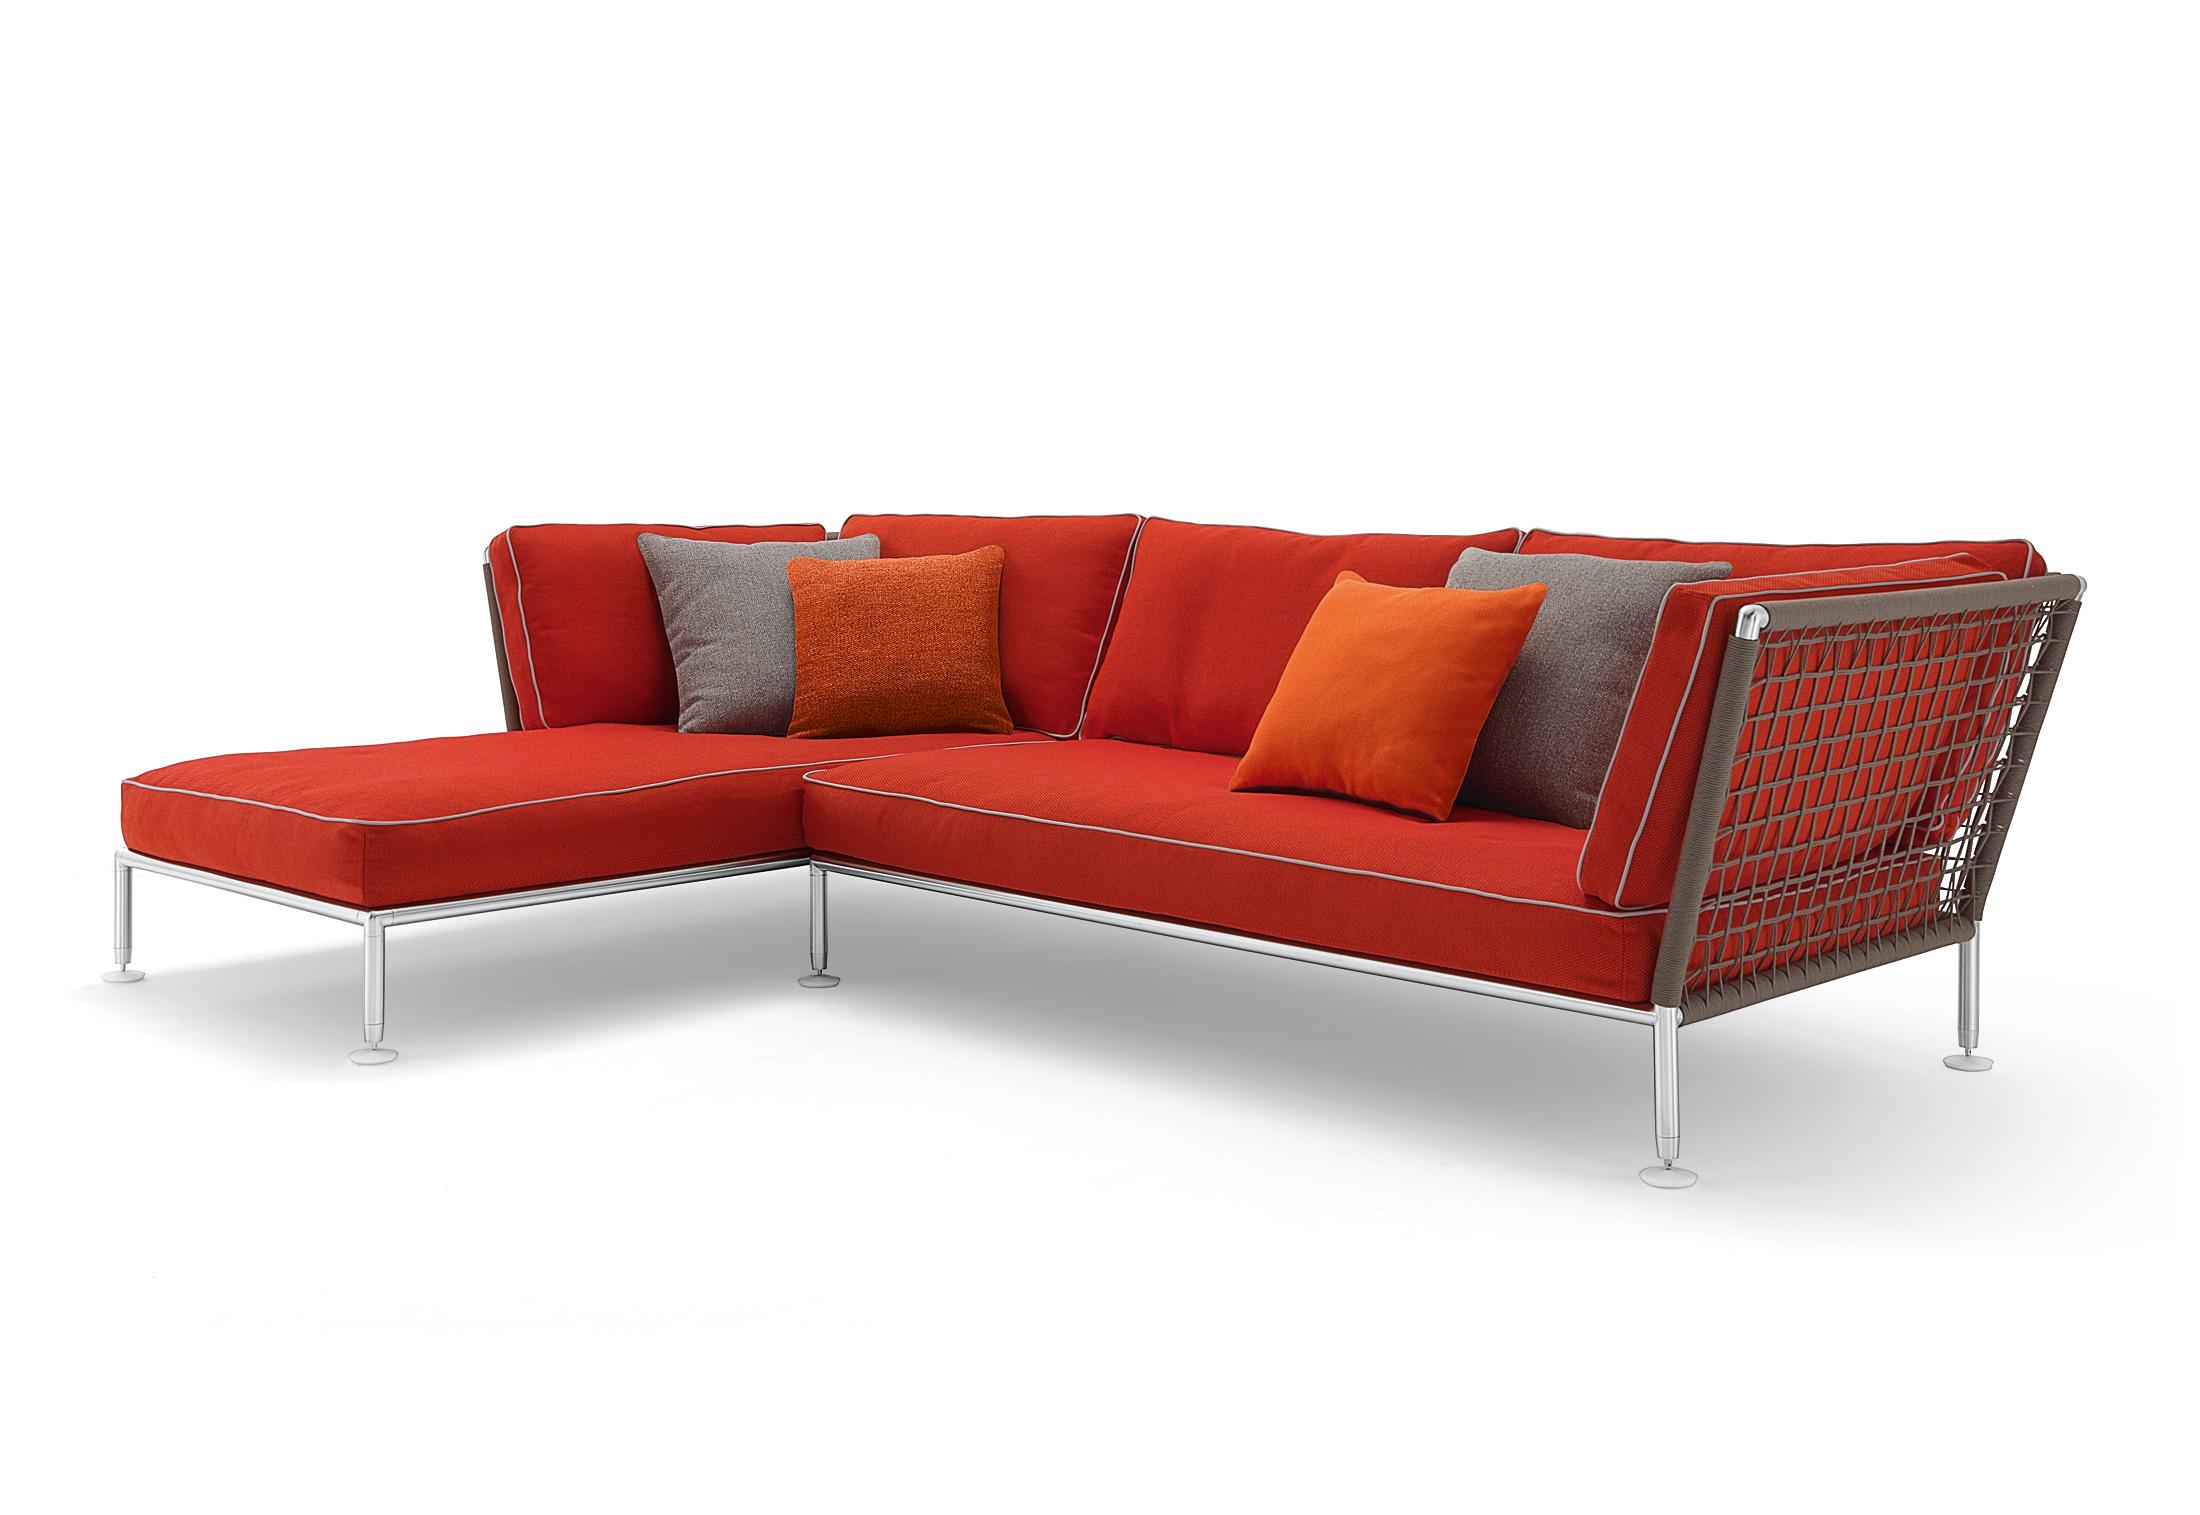 designer recamiere simple designer recamiere with designer recamiere elegant beaumont in. Black Bedroom Furniture Sets. Home Design Ideas